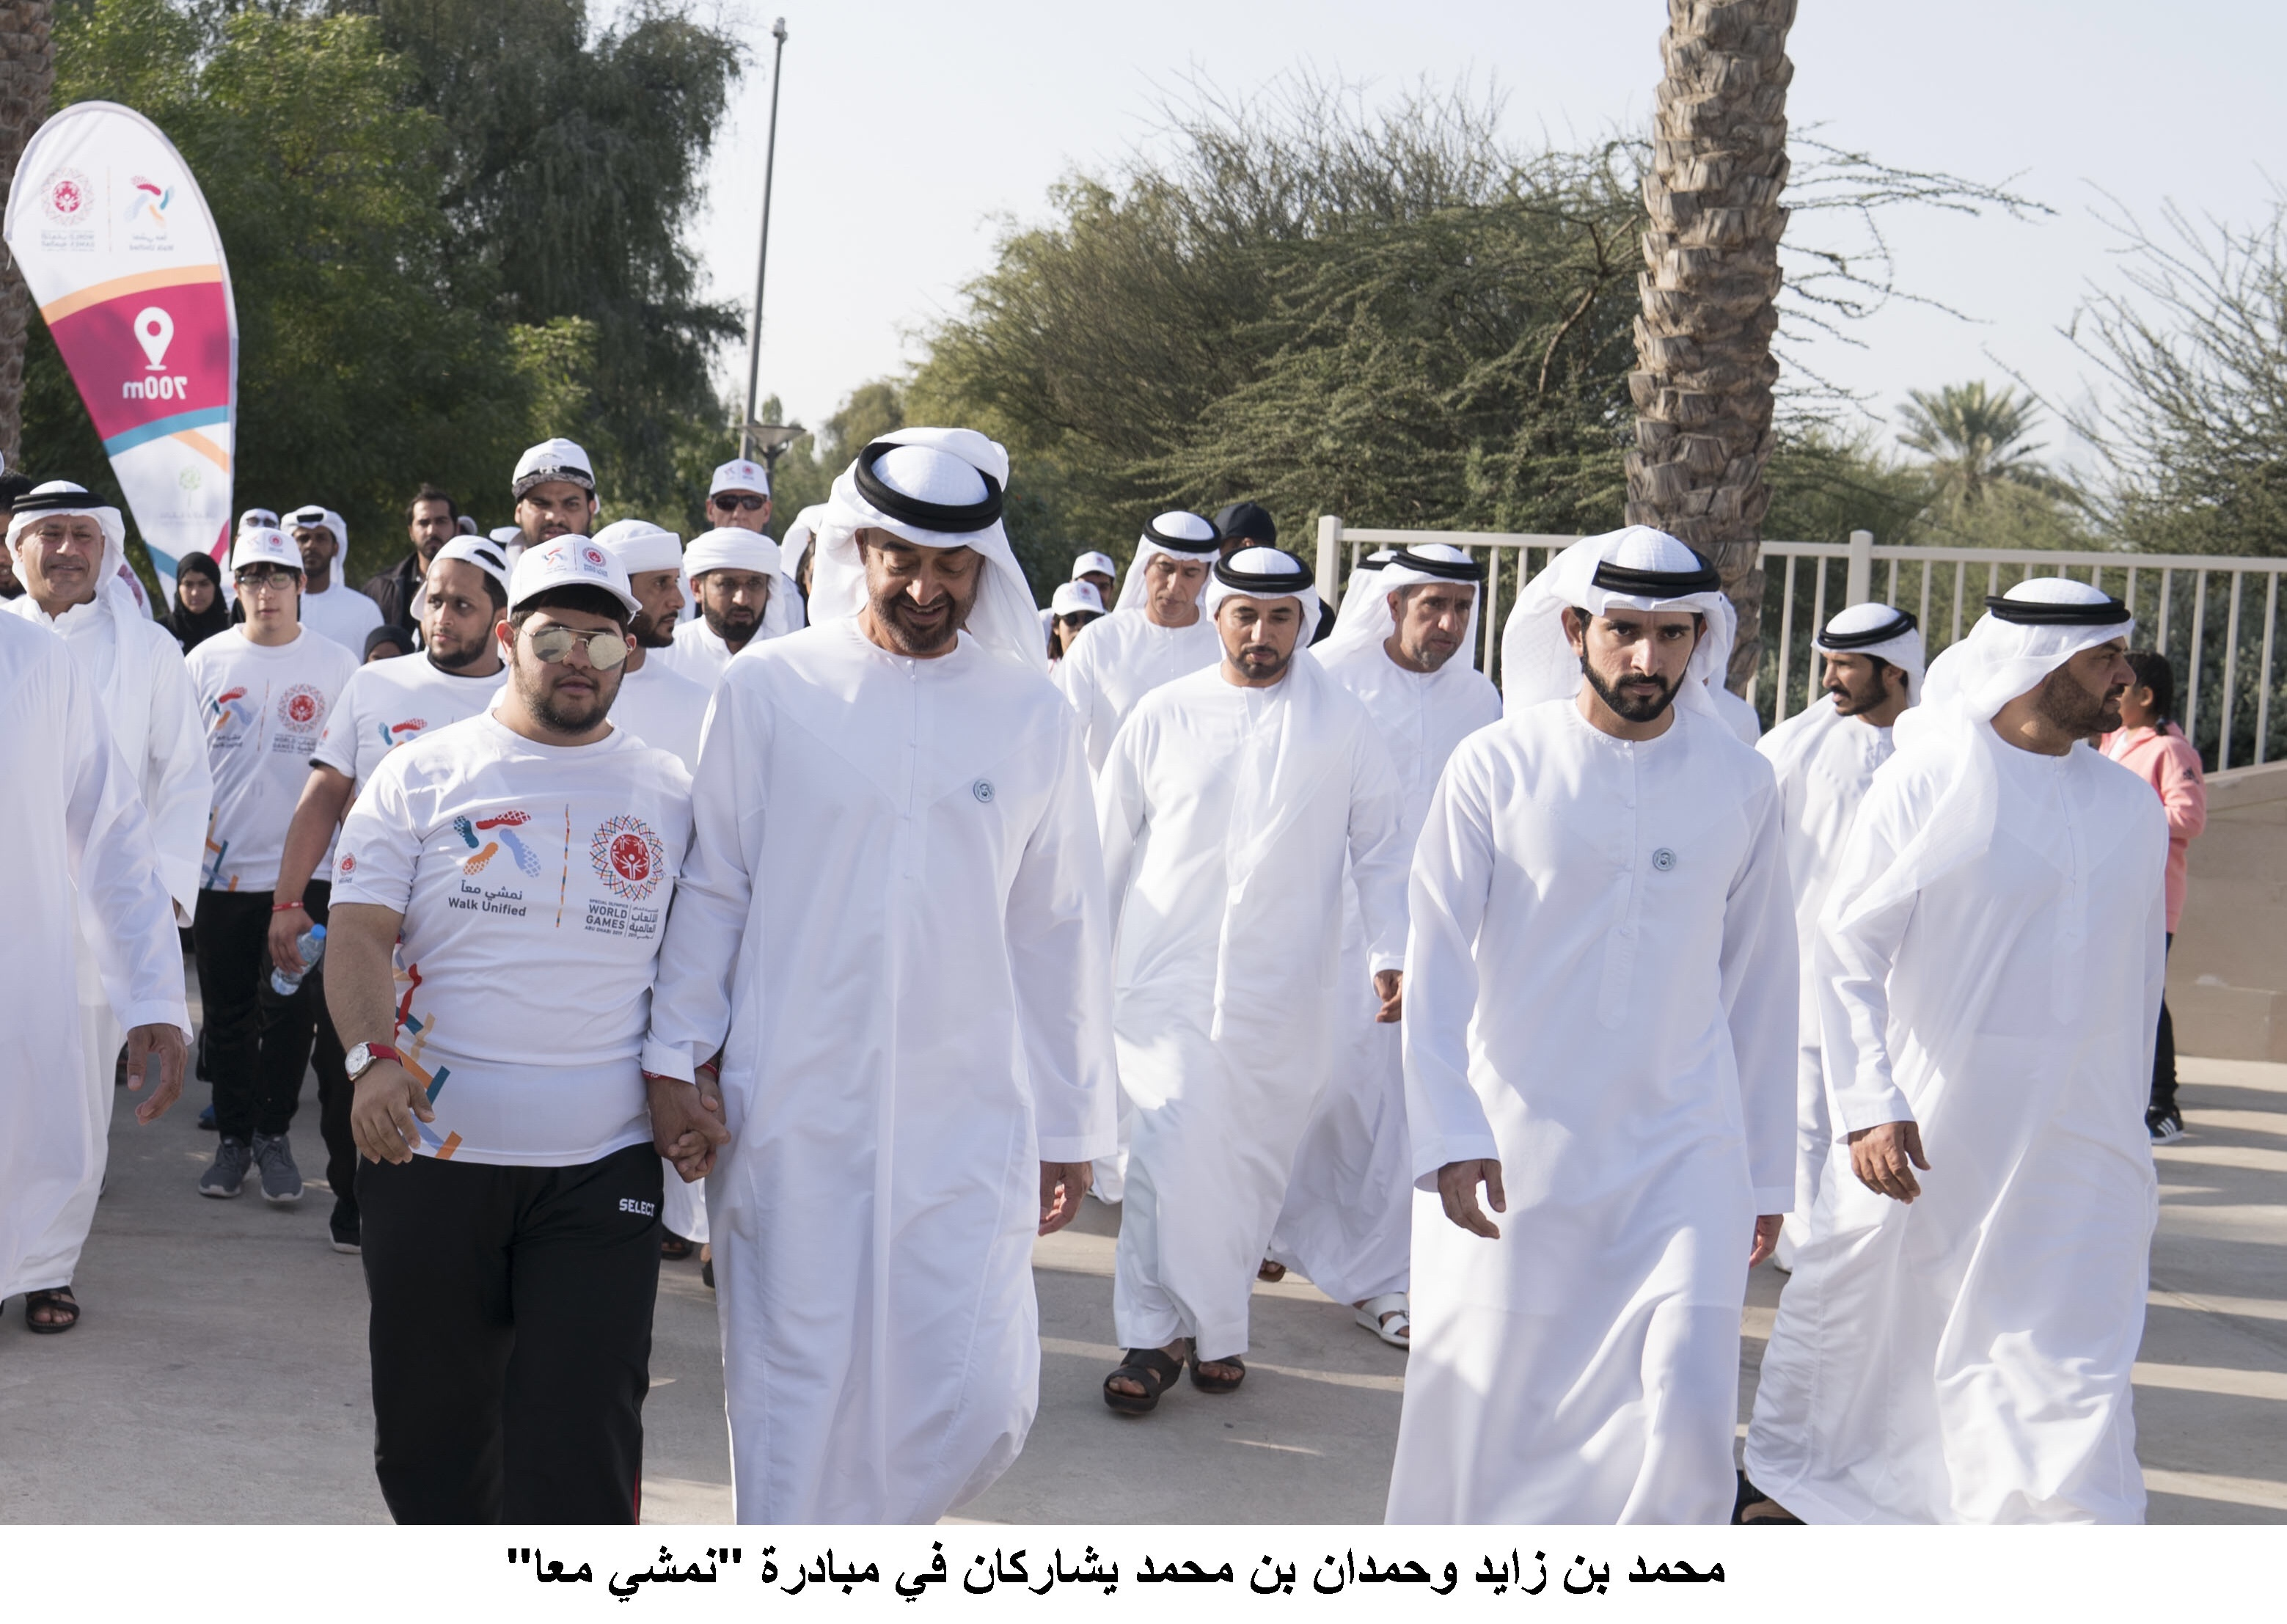 cc3d9a601 محمد بن زايد وحمدان بن محمد يشاركان في مبادرة نمشي معا – aau.ae